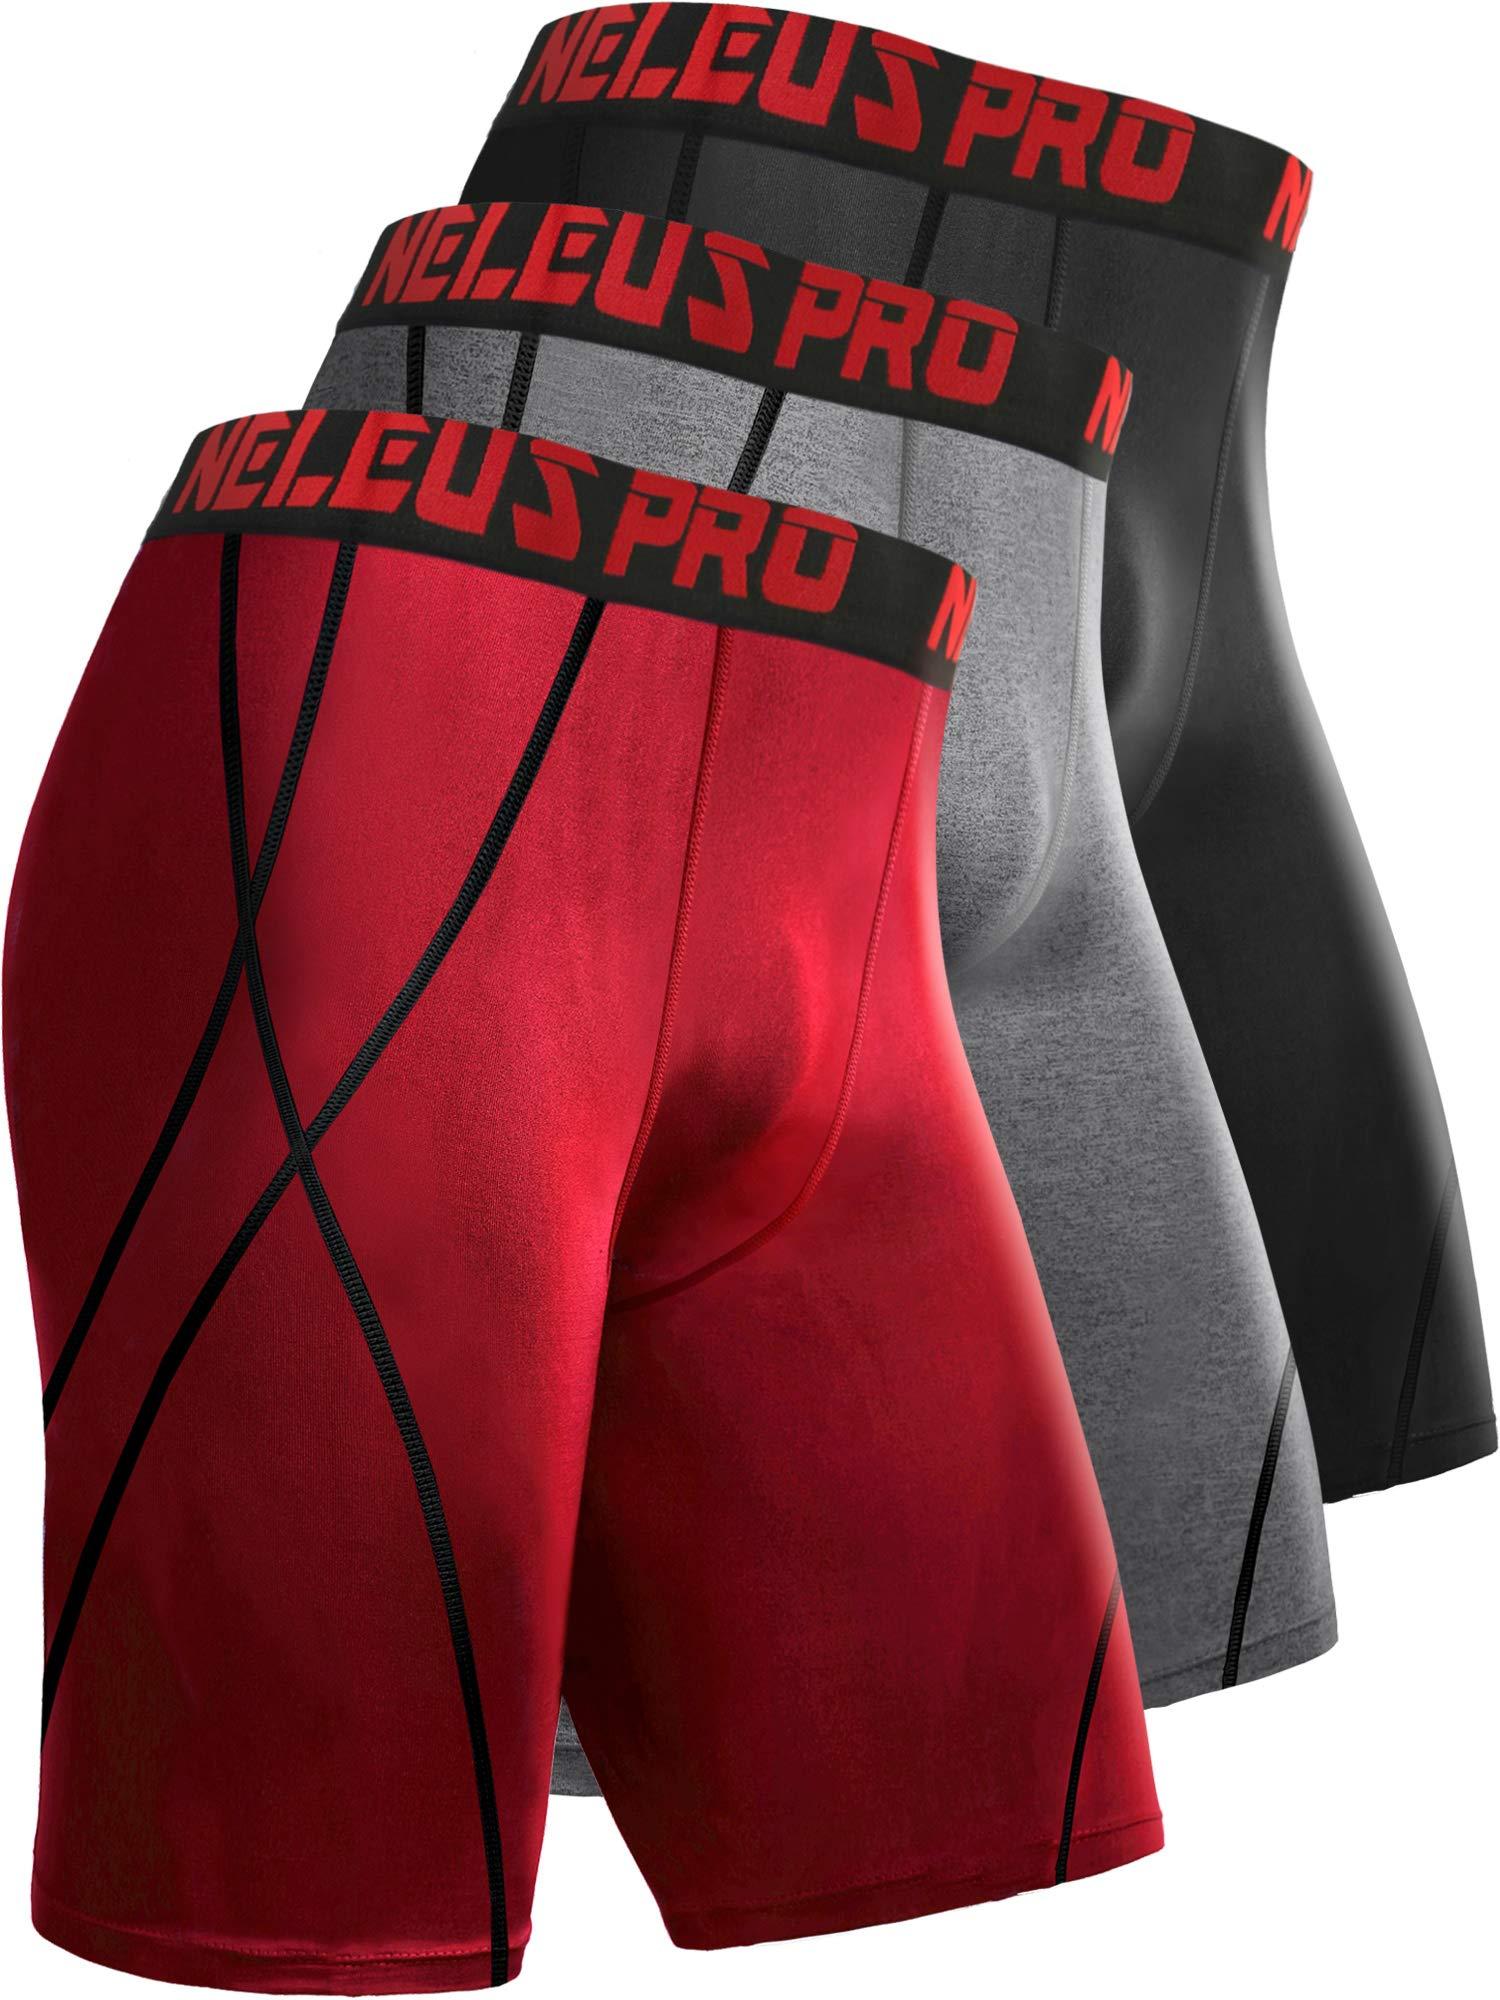 Neleus Men's 8 inch Compression Shorts,6010,3 Pack:Black,Grey,red,M,EU L by Neleus